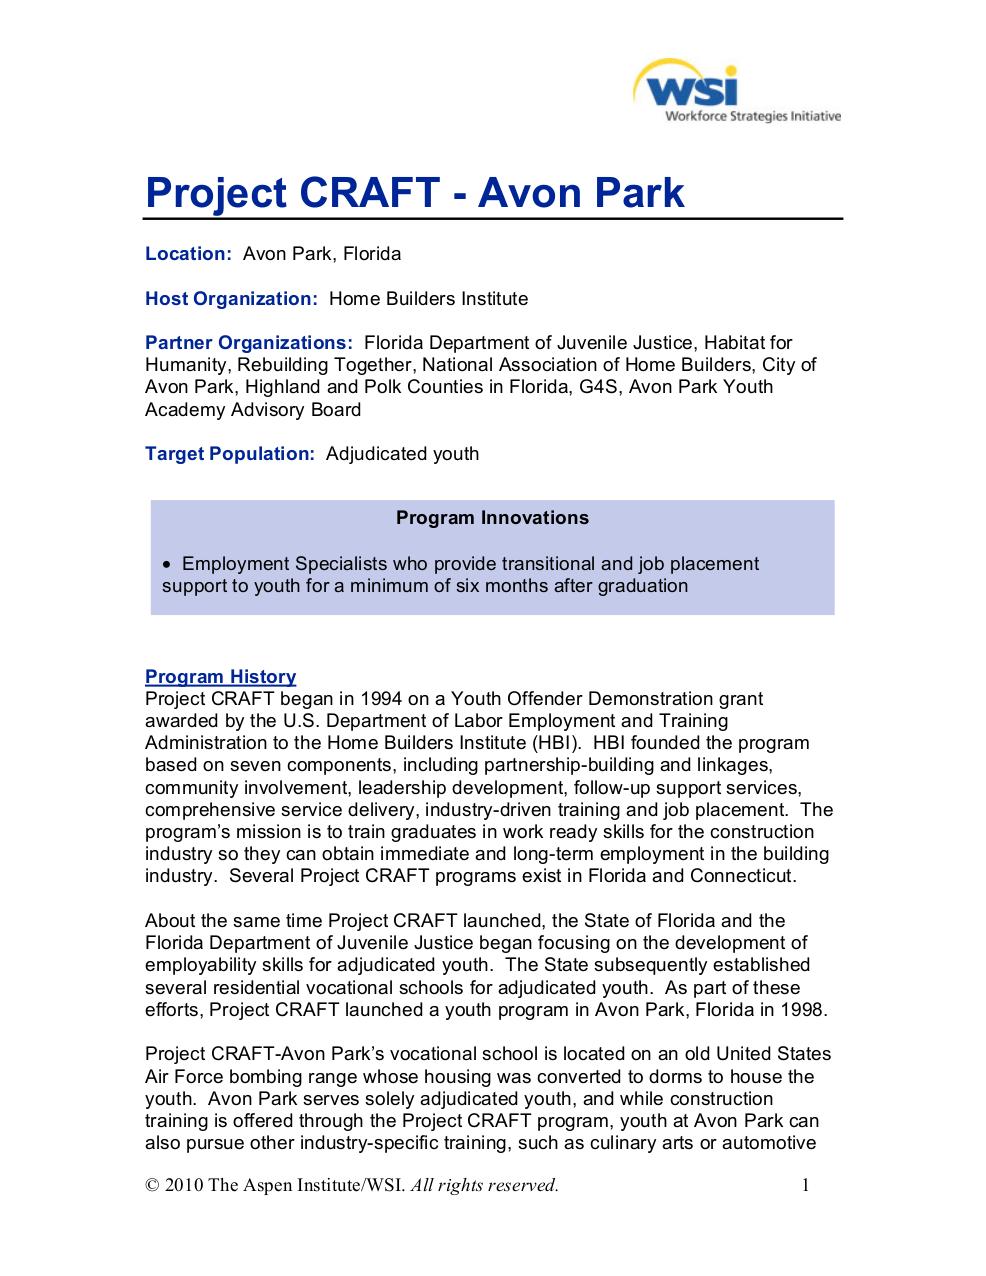 Project CRAFT Avon Park Fla